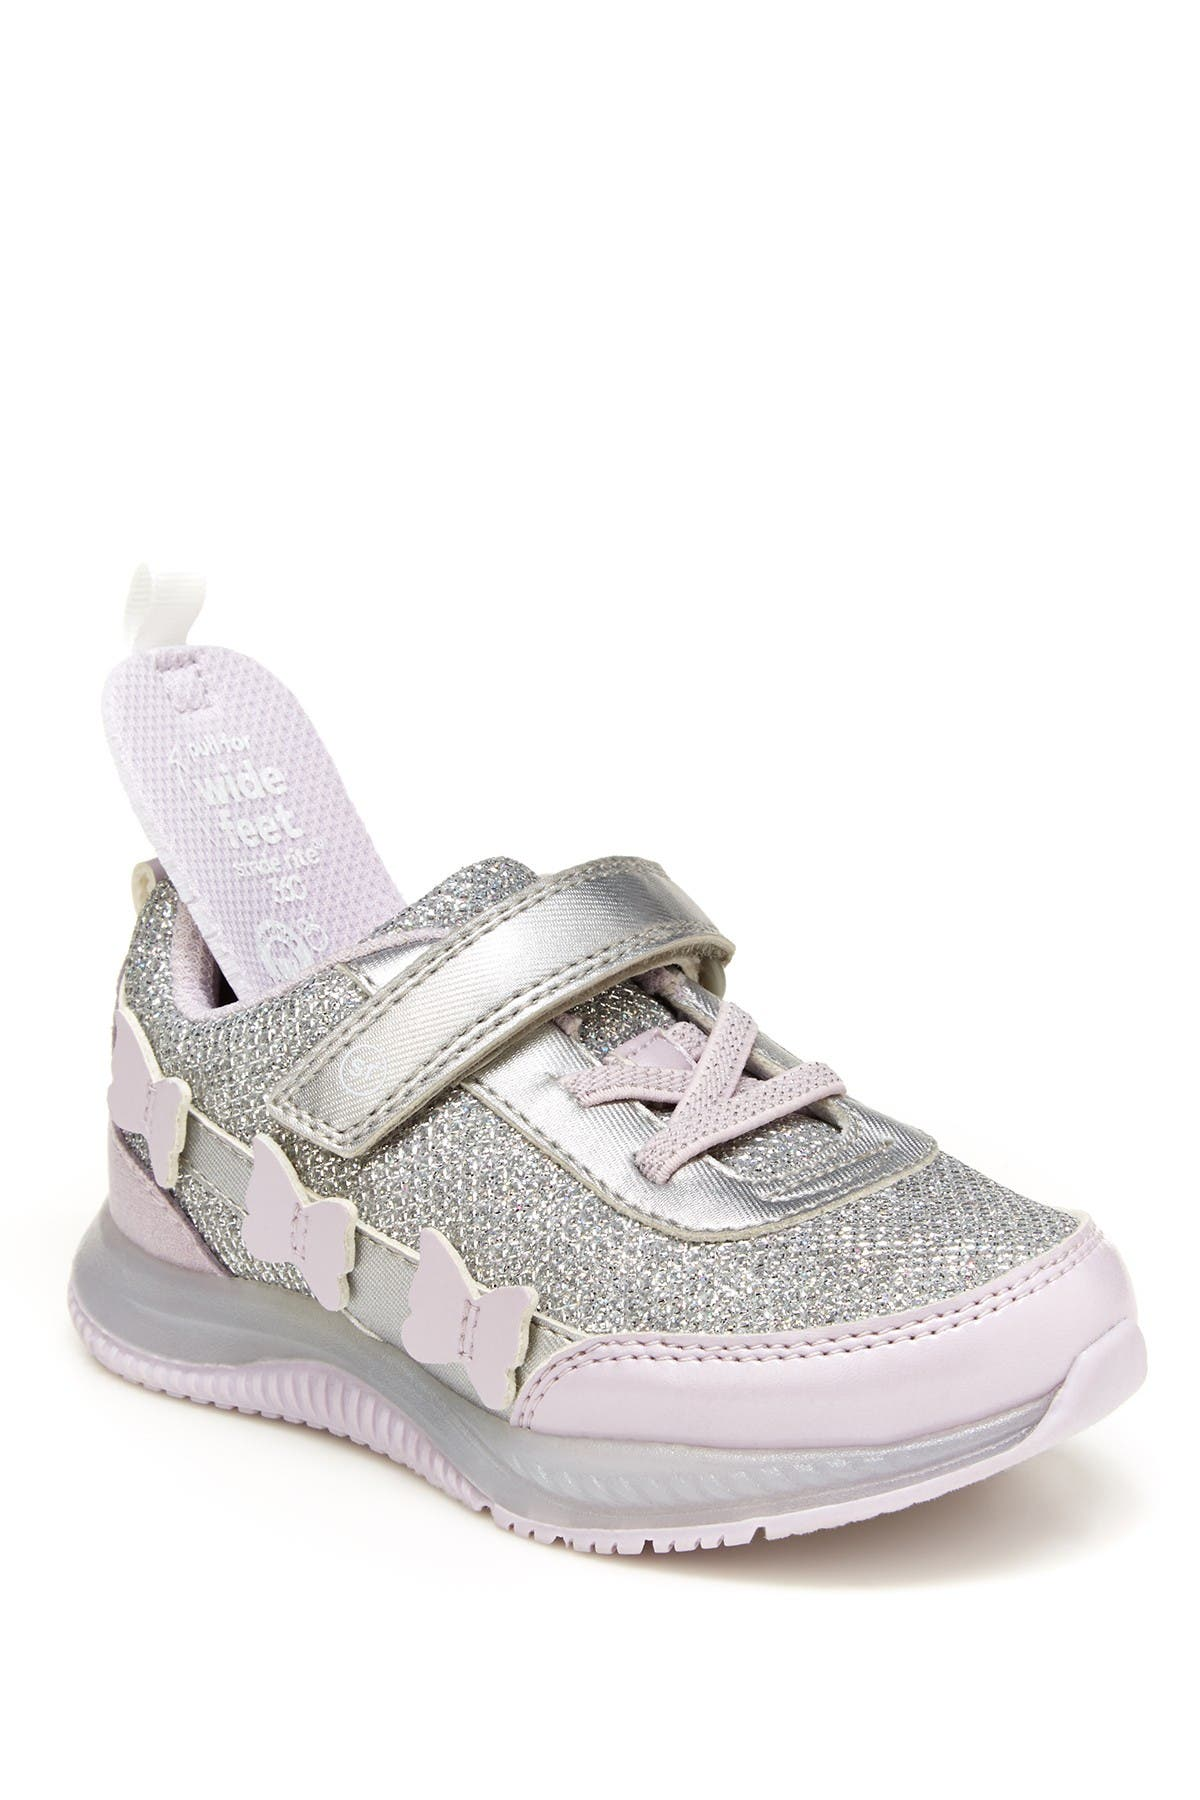 Image of Stride Rite Tinity Glitter Sneaker